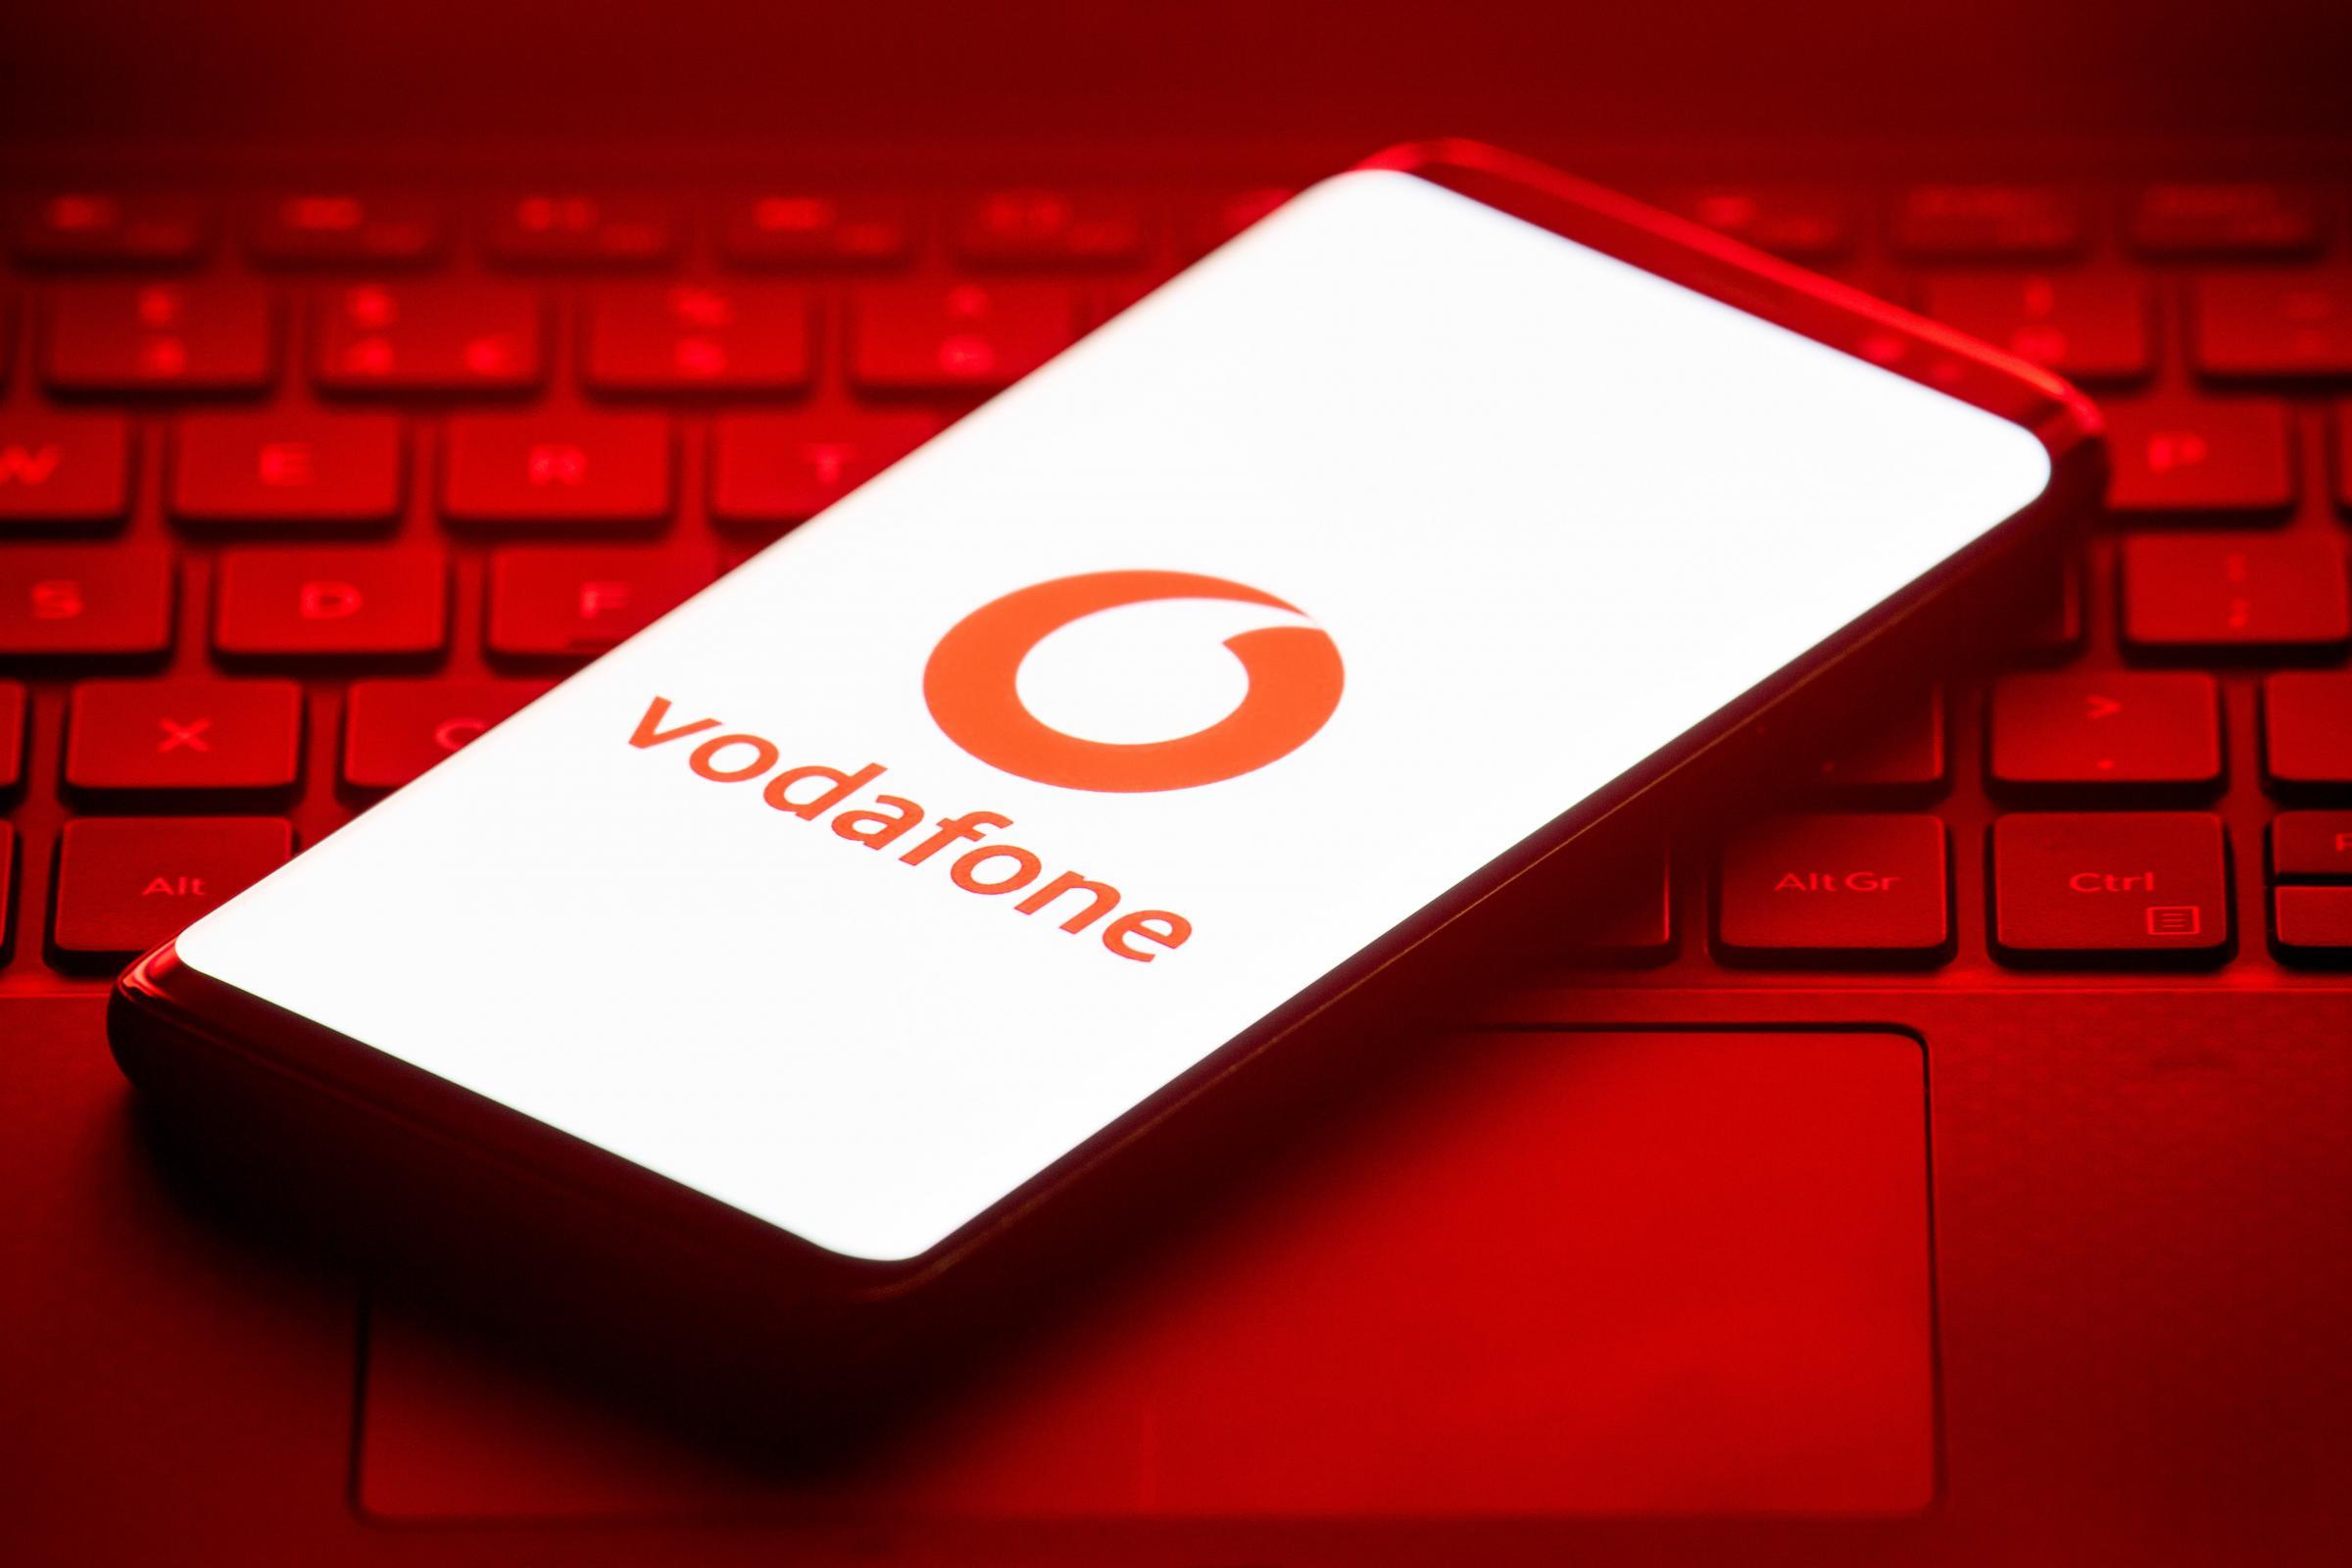 Vodafone slashes dividend 40% in bid to bolster balance sheet